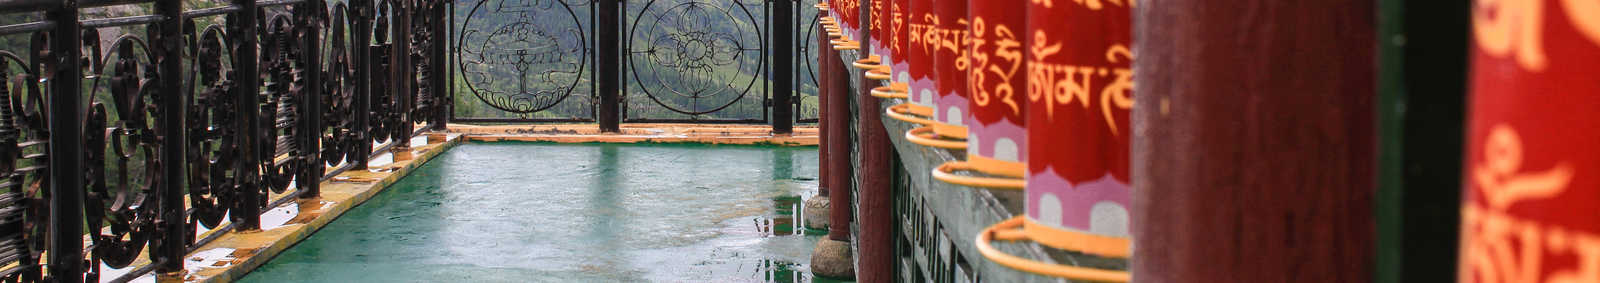 Prayer wheels in Terelj, Mongolia